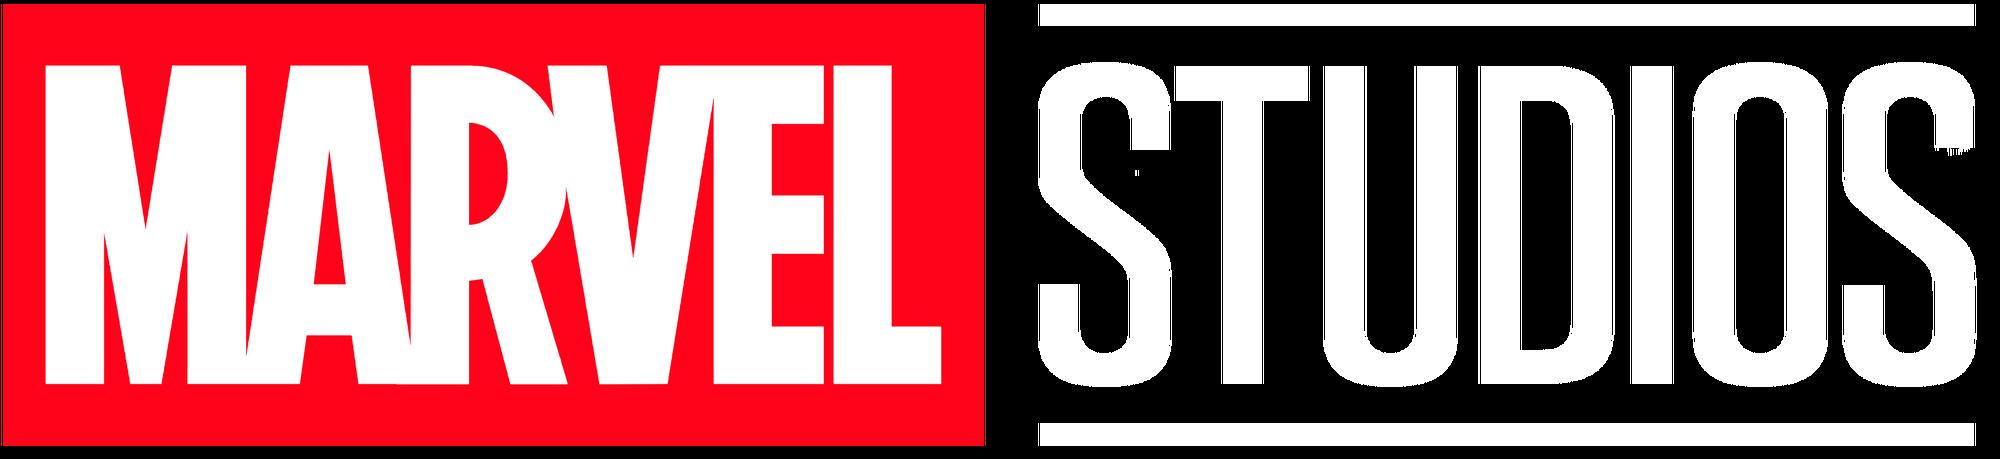 Image - Marvel Studios 2016 Transparent Logo.png | Disney ...